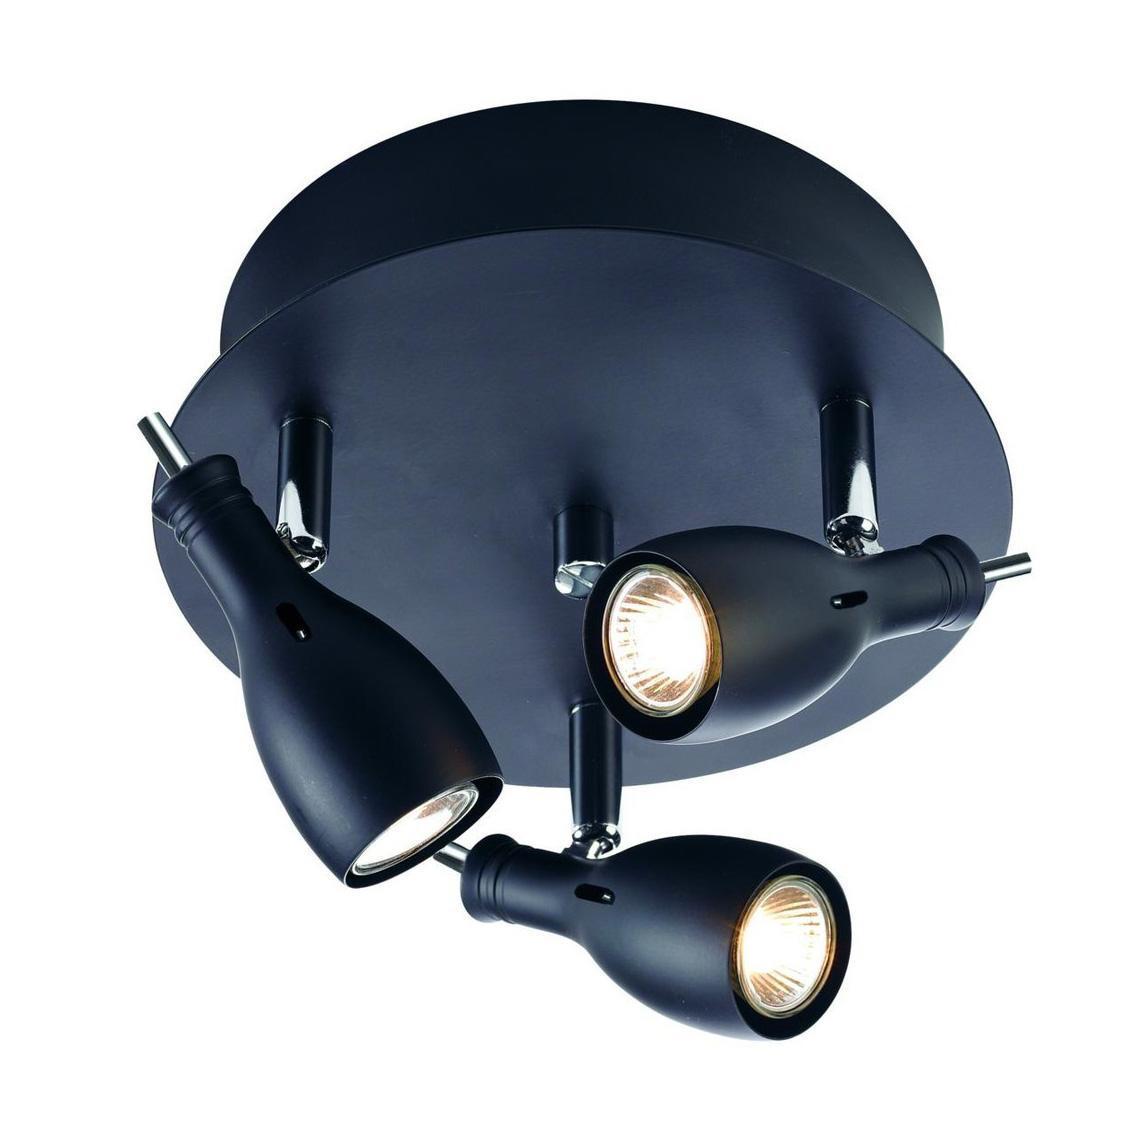 Настенно-потолочный светильник MarkSLojd Lammhult 102388102388